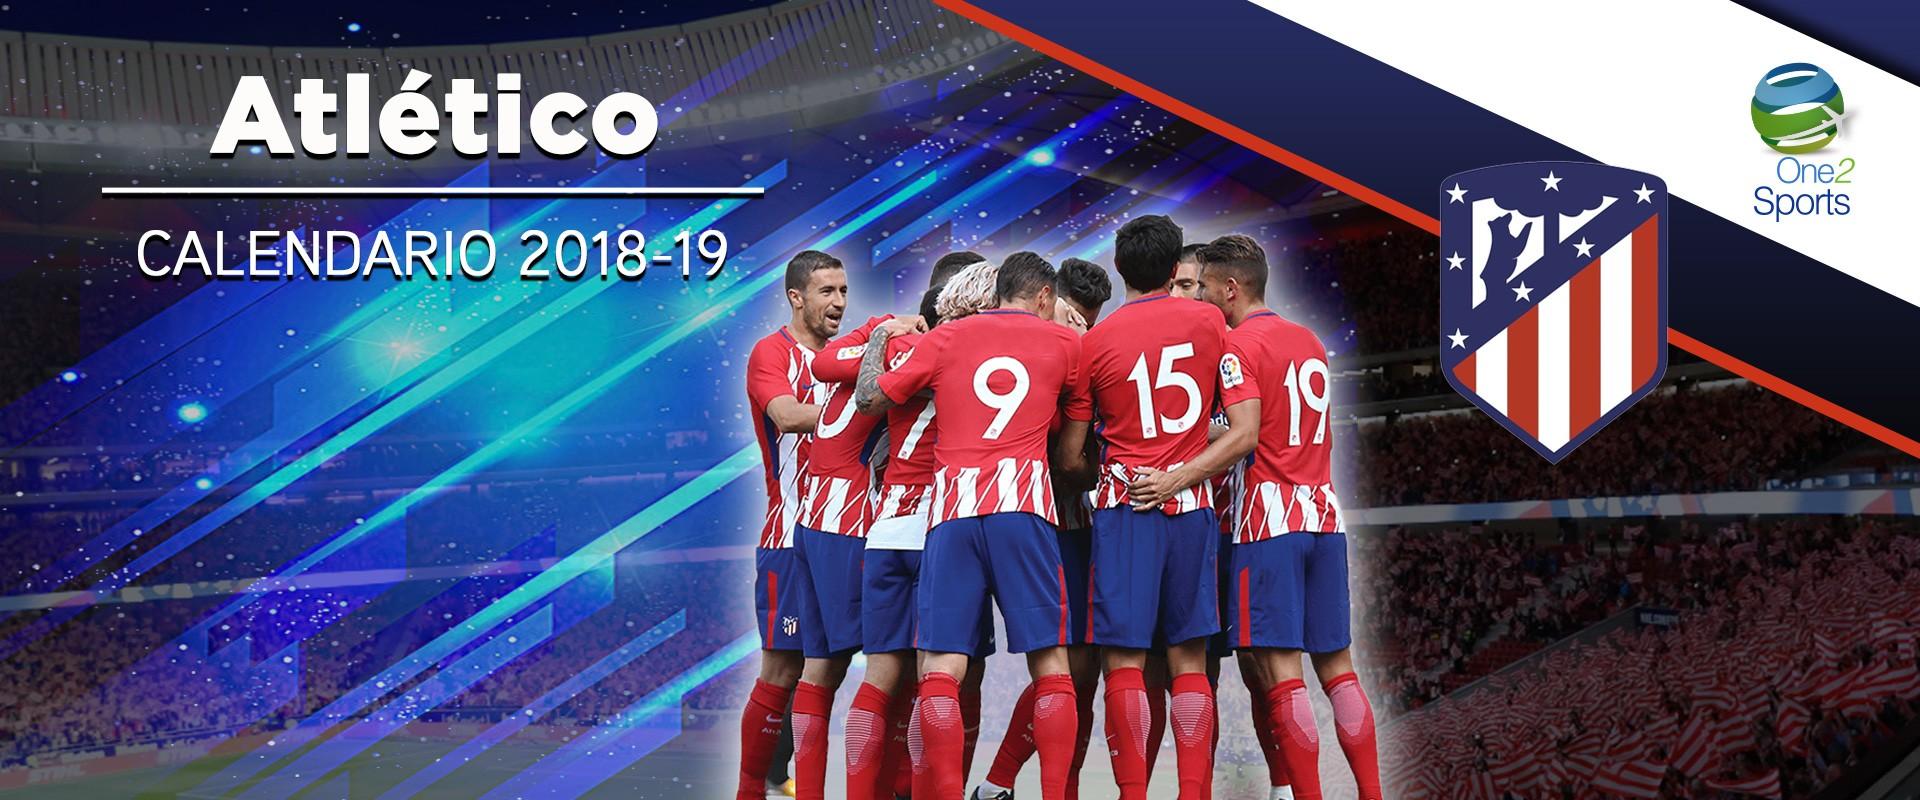 Calendario Atletico Madrid.Calendario Atletico Madrid One2 Travel Group